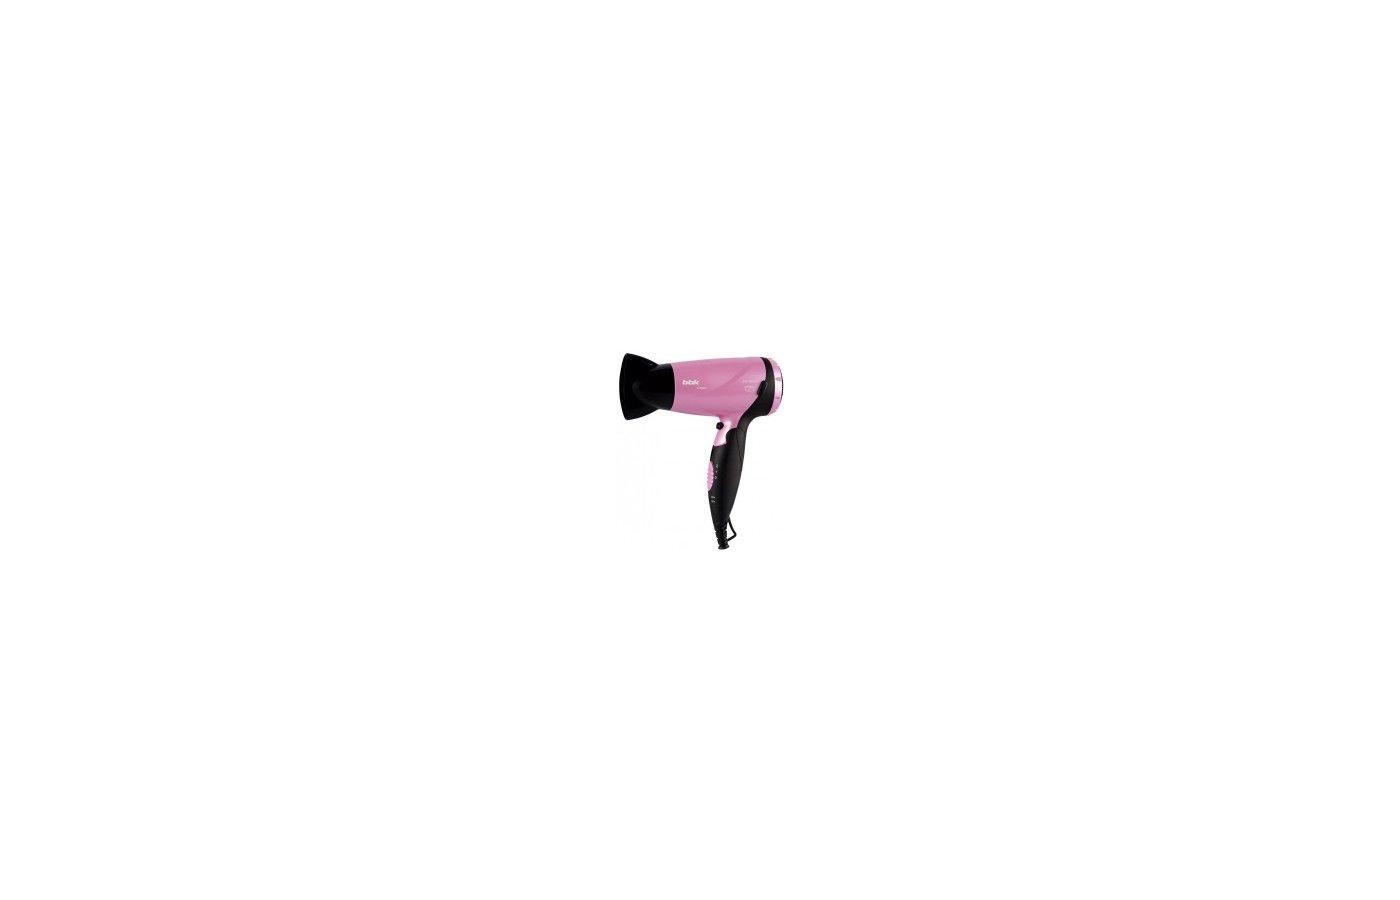 Фены BBK BHD1603i коричневый/розовый